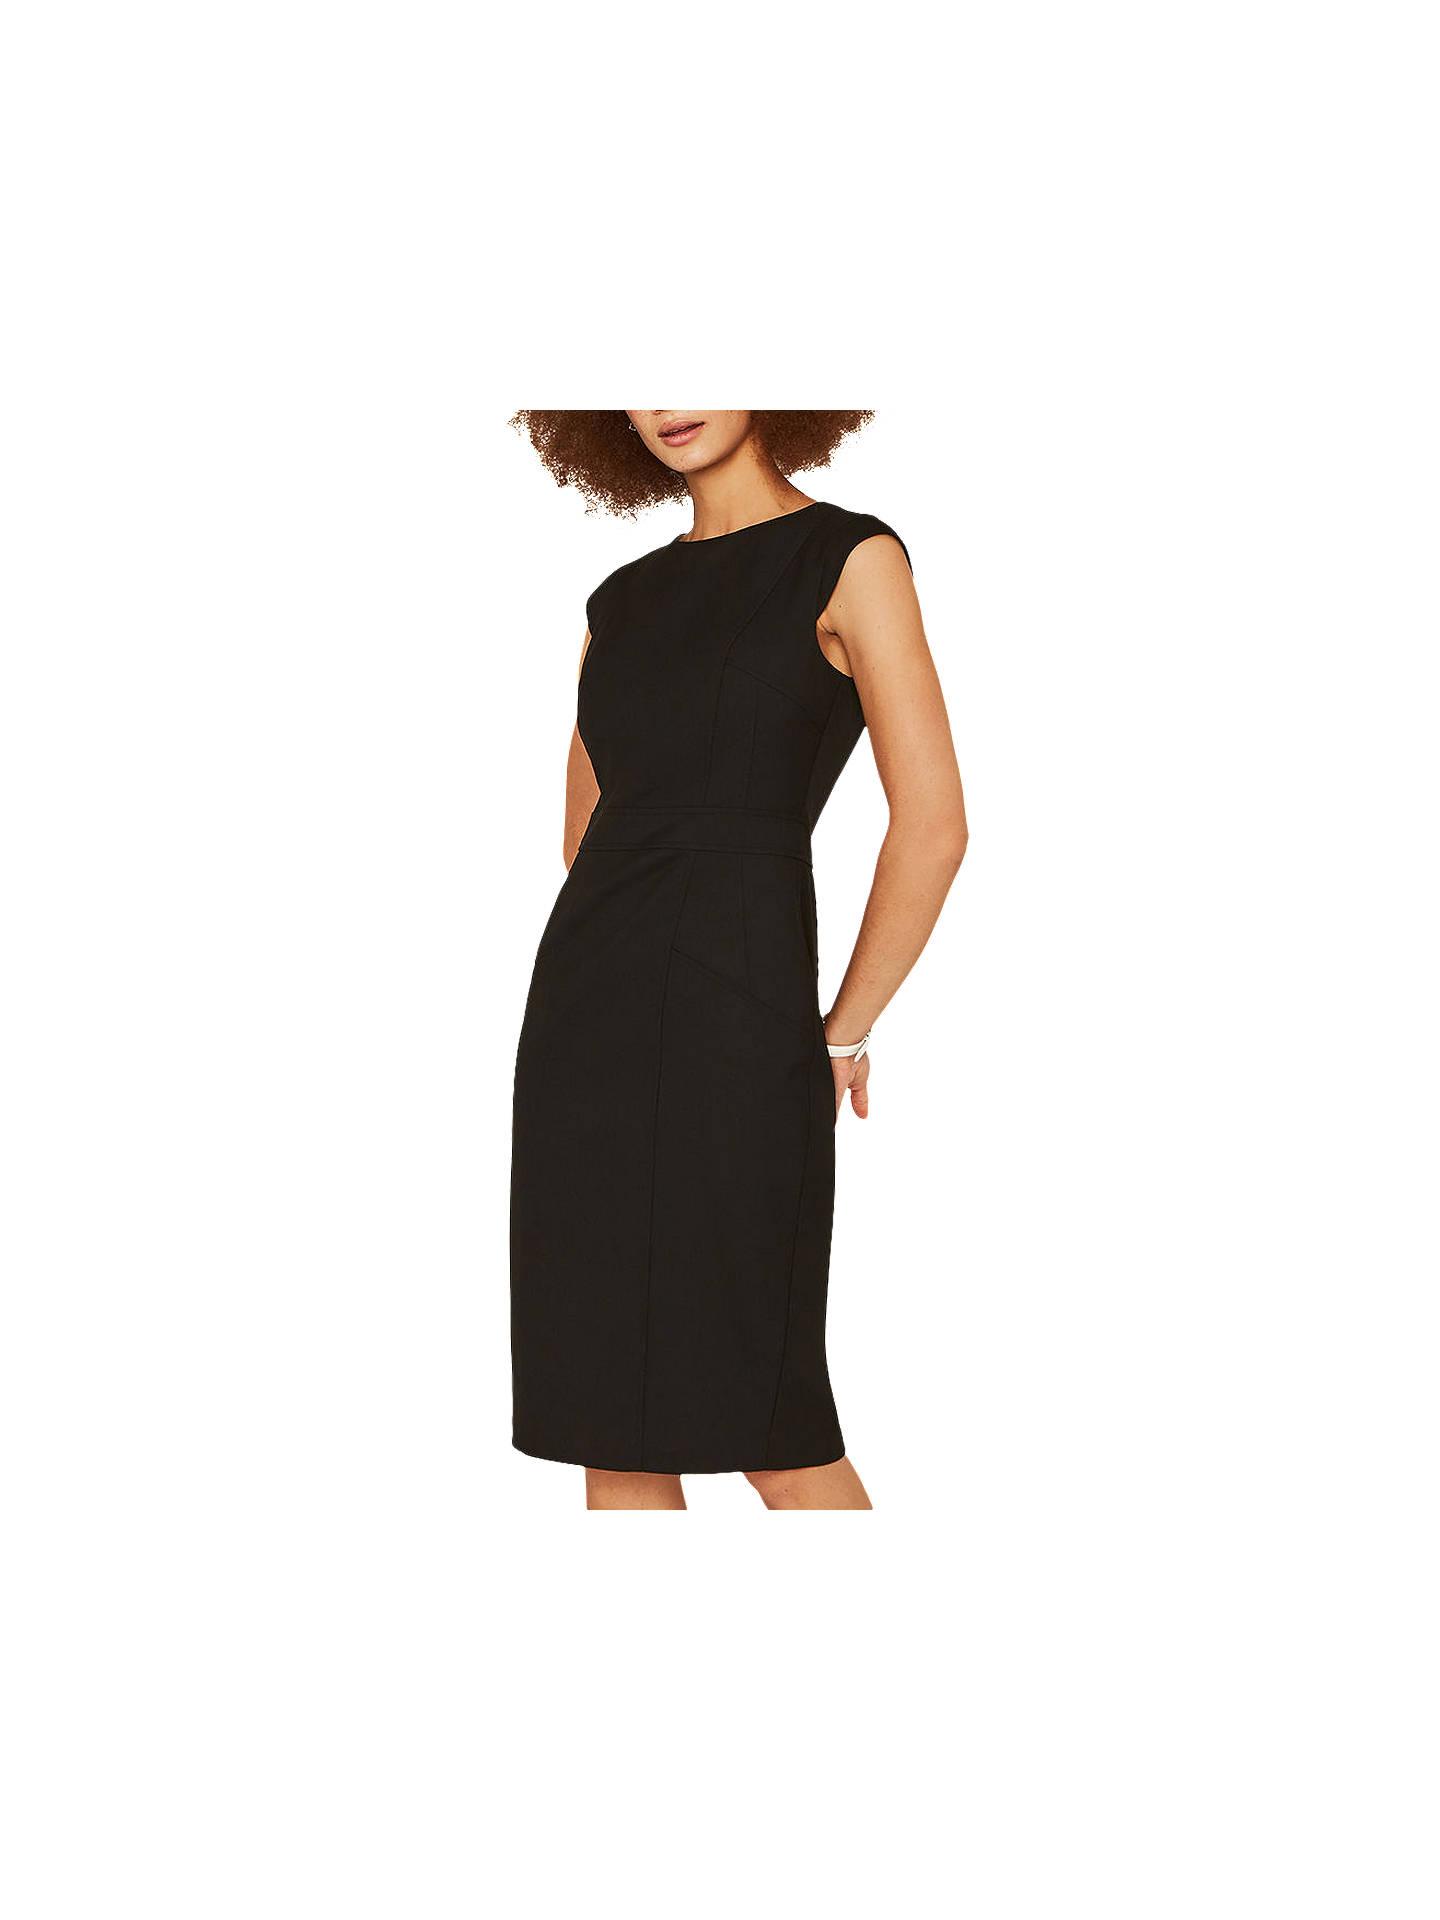 3b445cbb260e Buy Oasis Tailored Midi Dress, Black, 6 Online at johnlewis.com ...